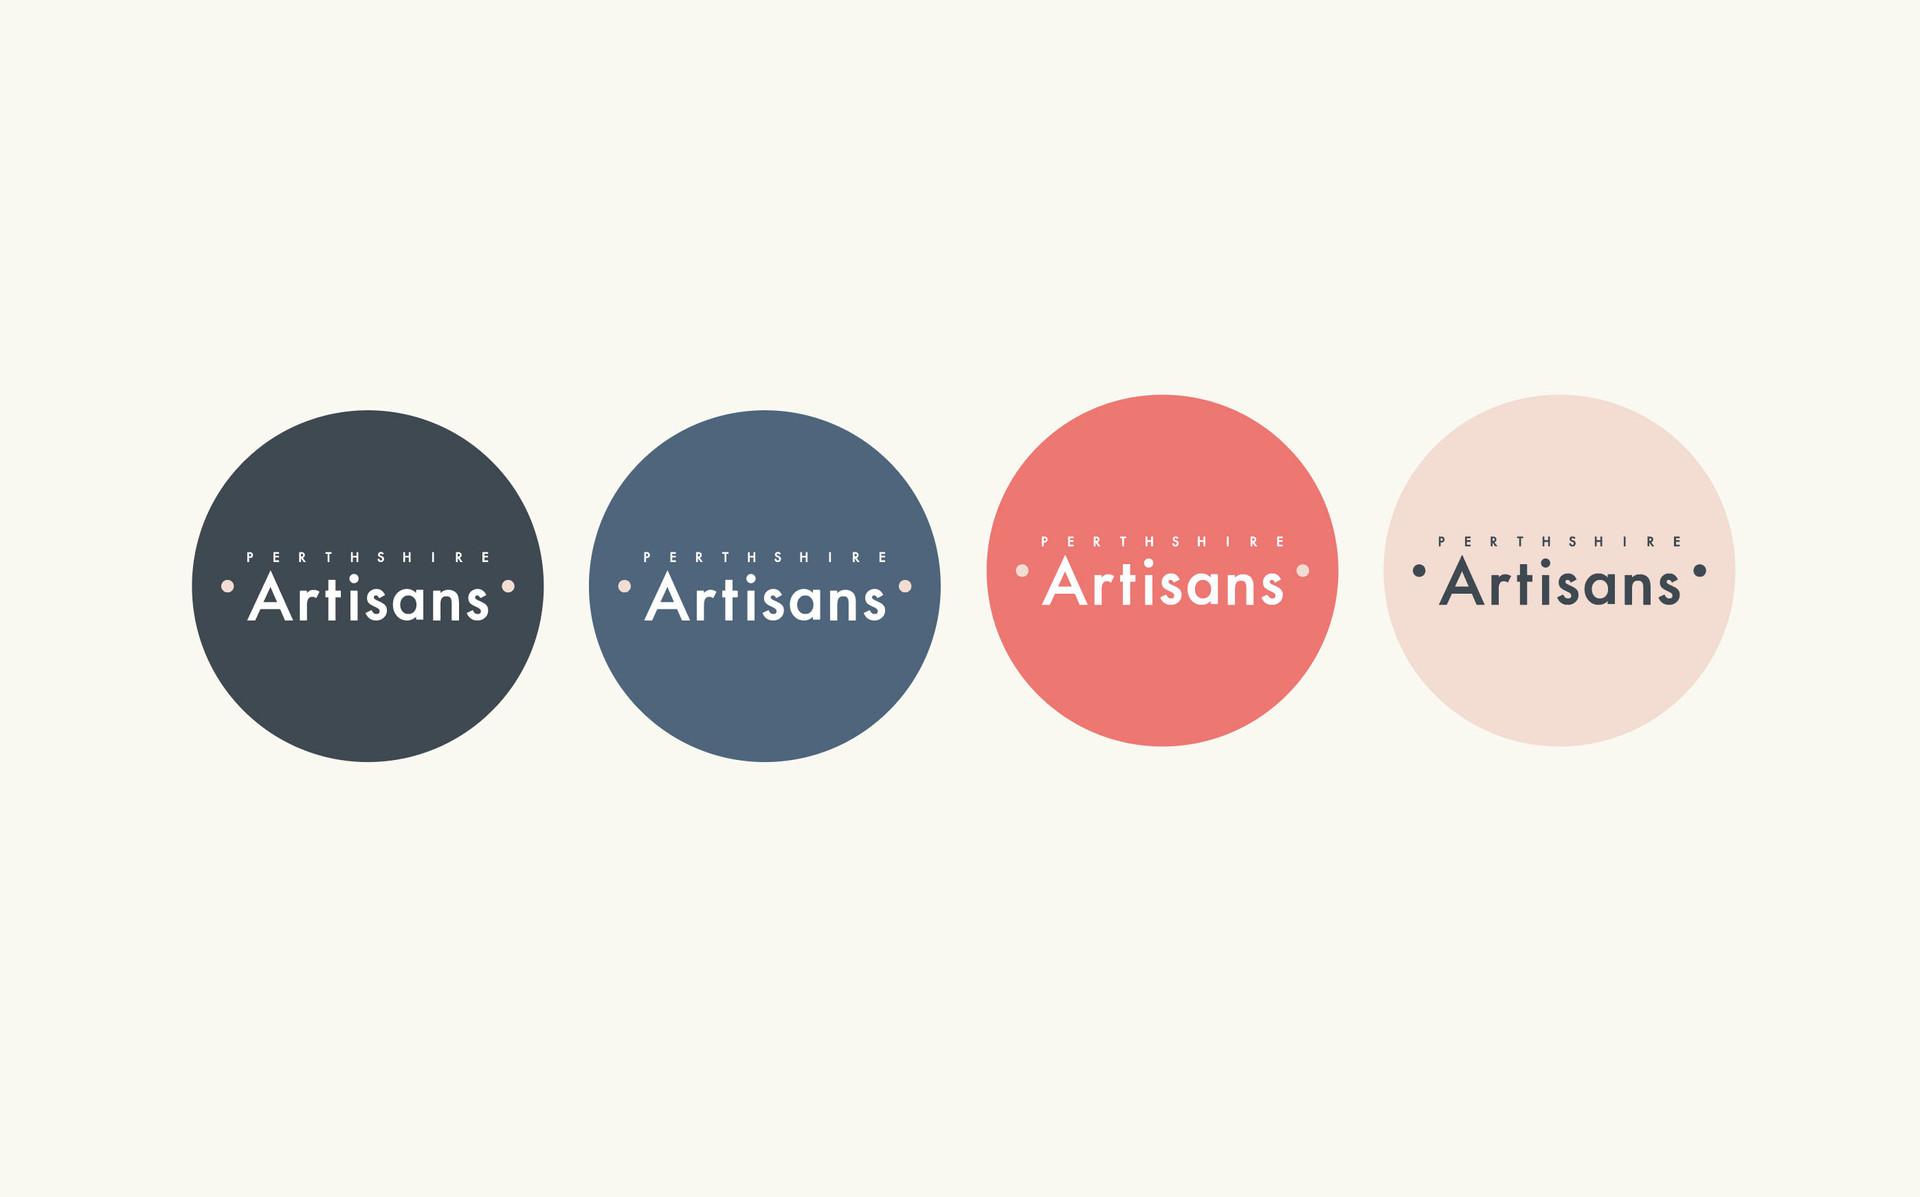 Perthshire Artisans Stickers